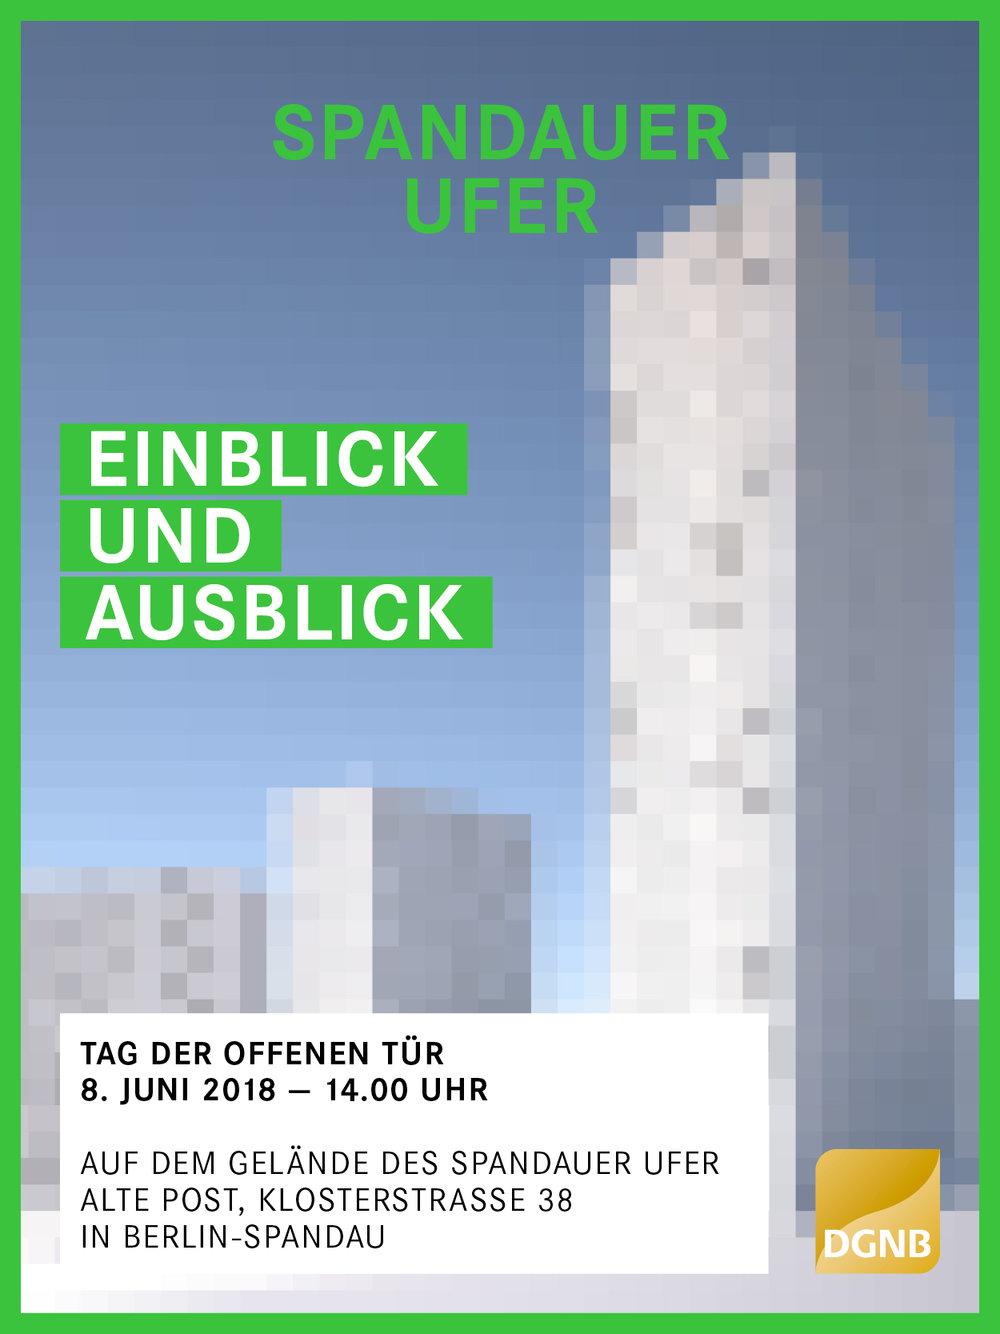 180608_SU_Einblick+Ausblick_Tag d off Tür.jpg